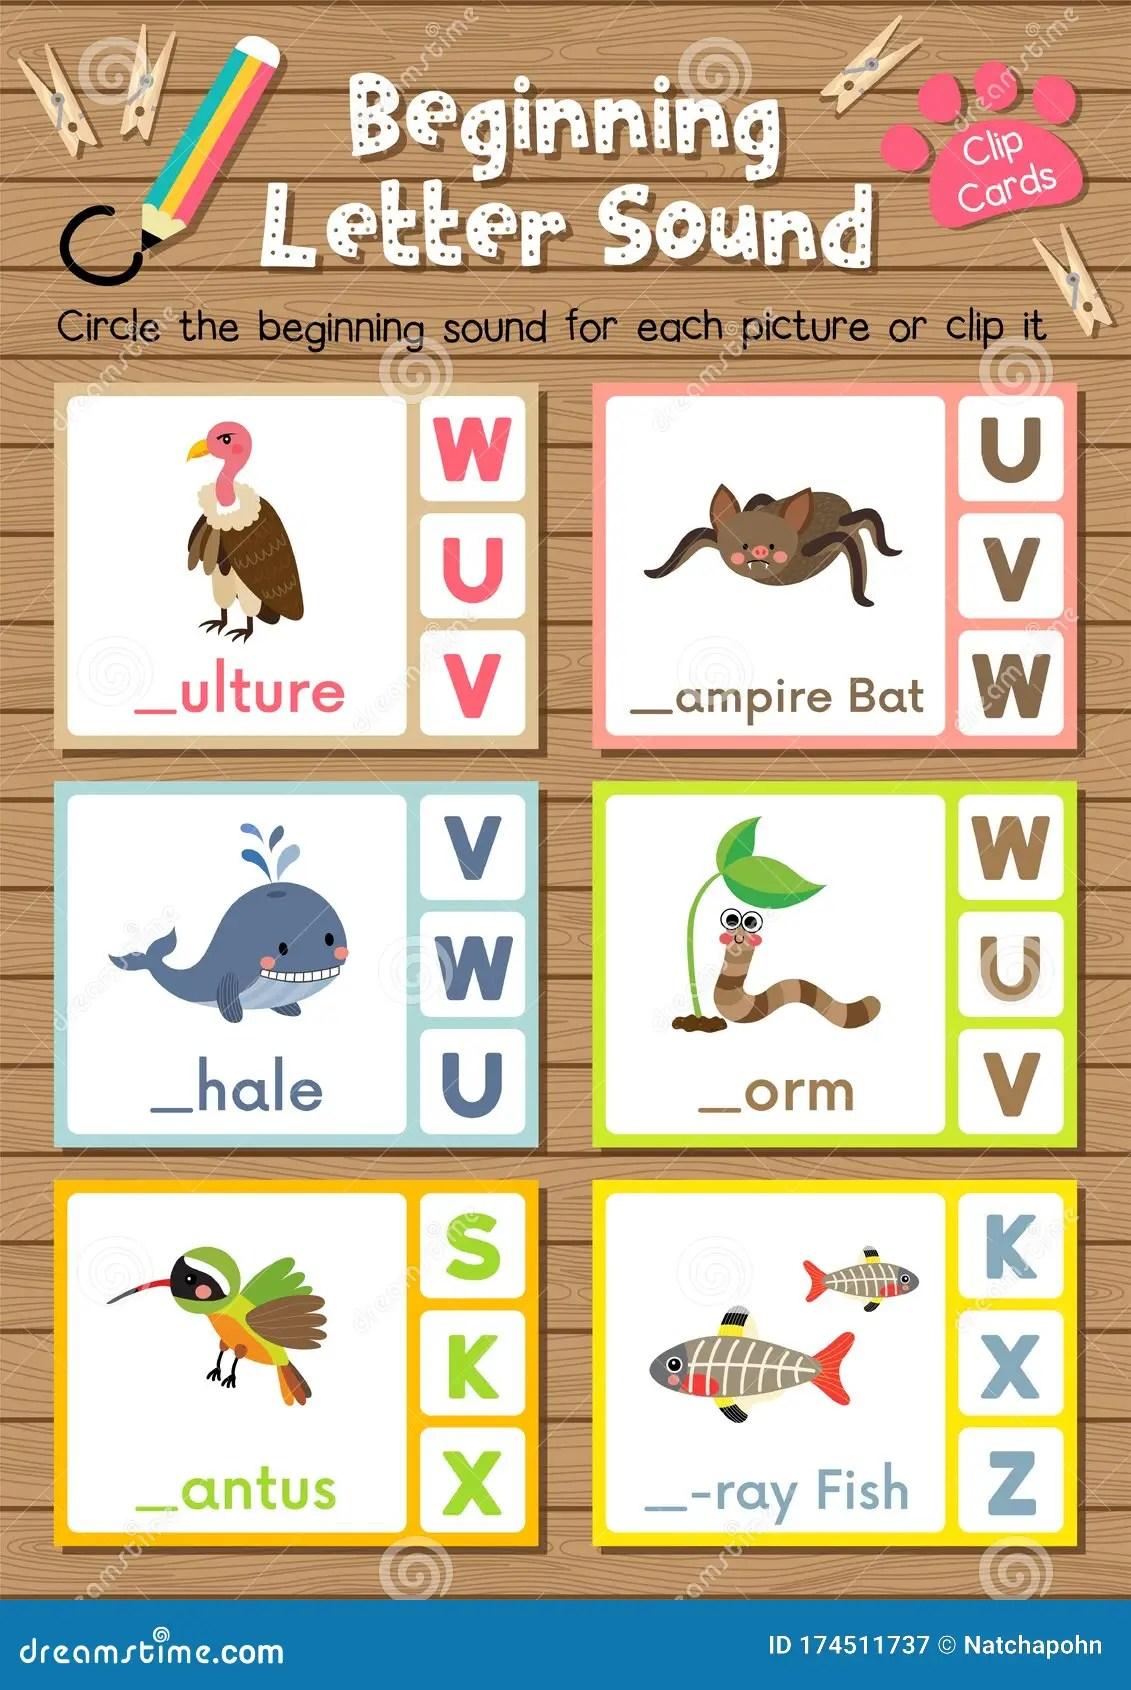 Worksheet Matching Vocabulary Vwx Stock Vector